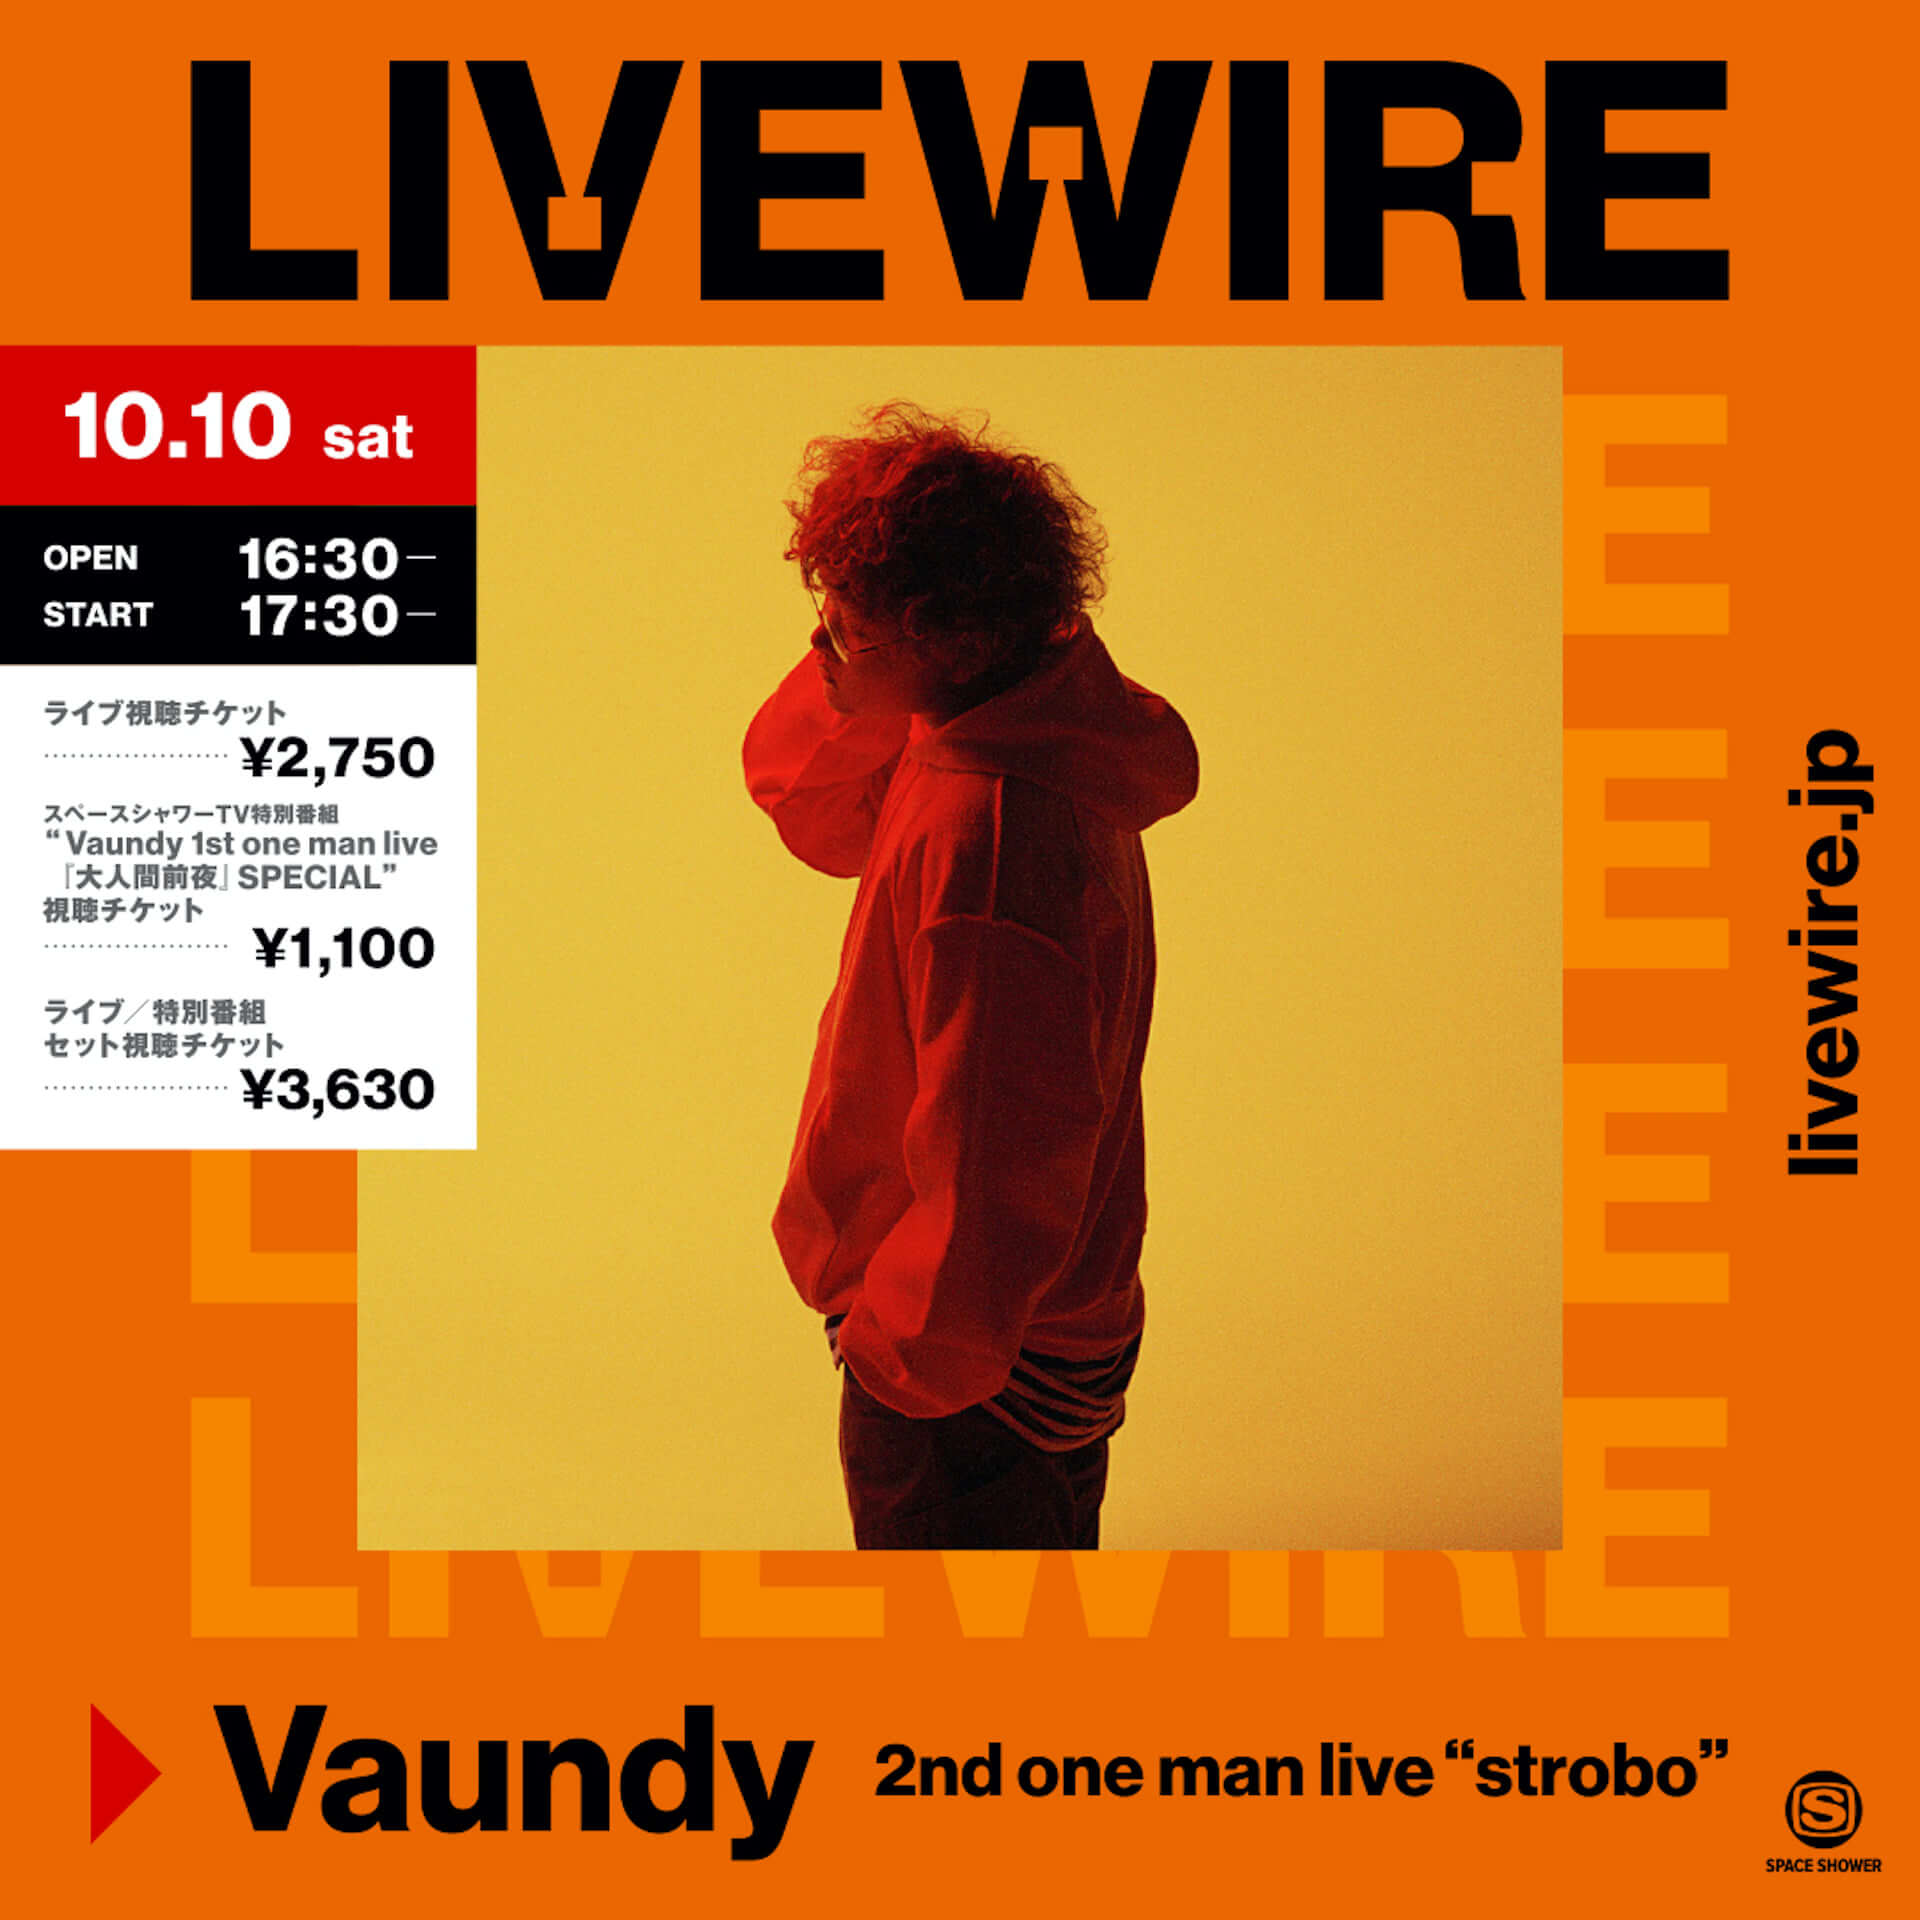 VaundyのZepp Hanedaワンマンライブが<LIVEWIRE>で生配信決定!初ワンマンの模様を収めた特別番組の視聴チケットも発売 music200928_vaundy_1-1920x1920